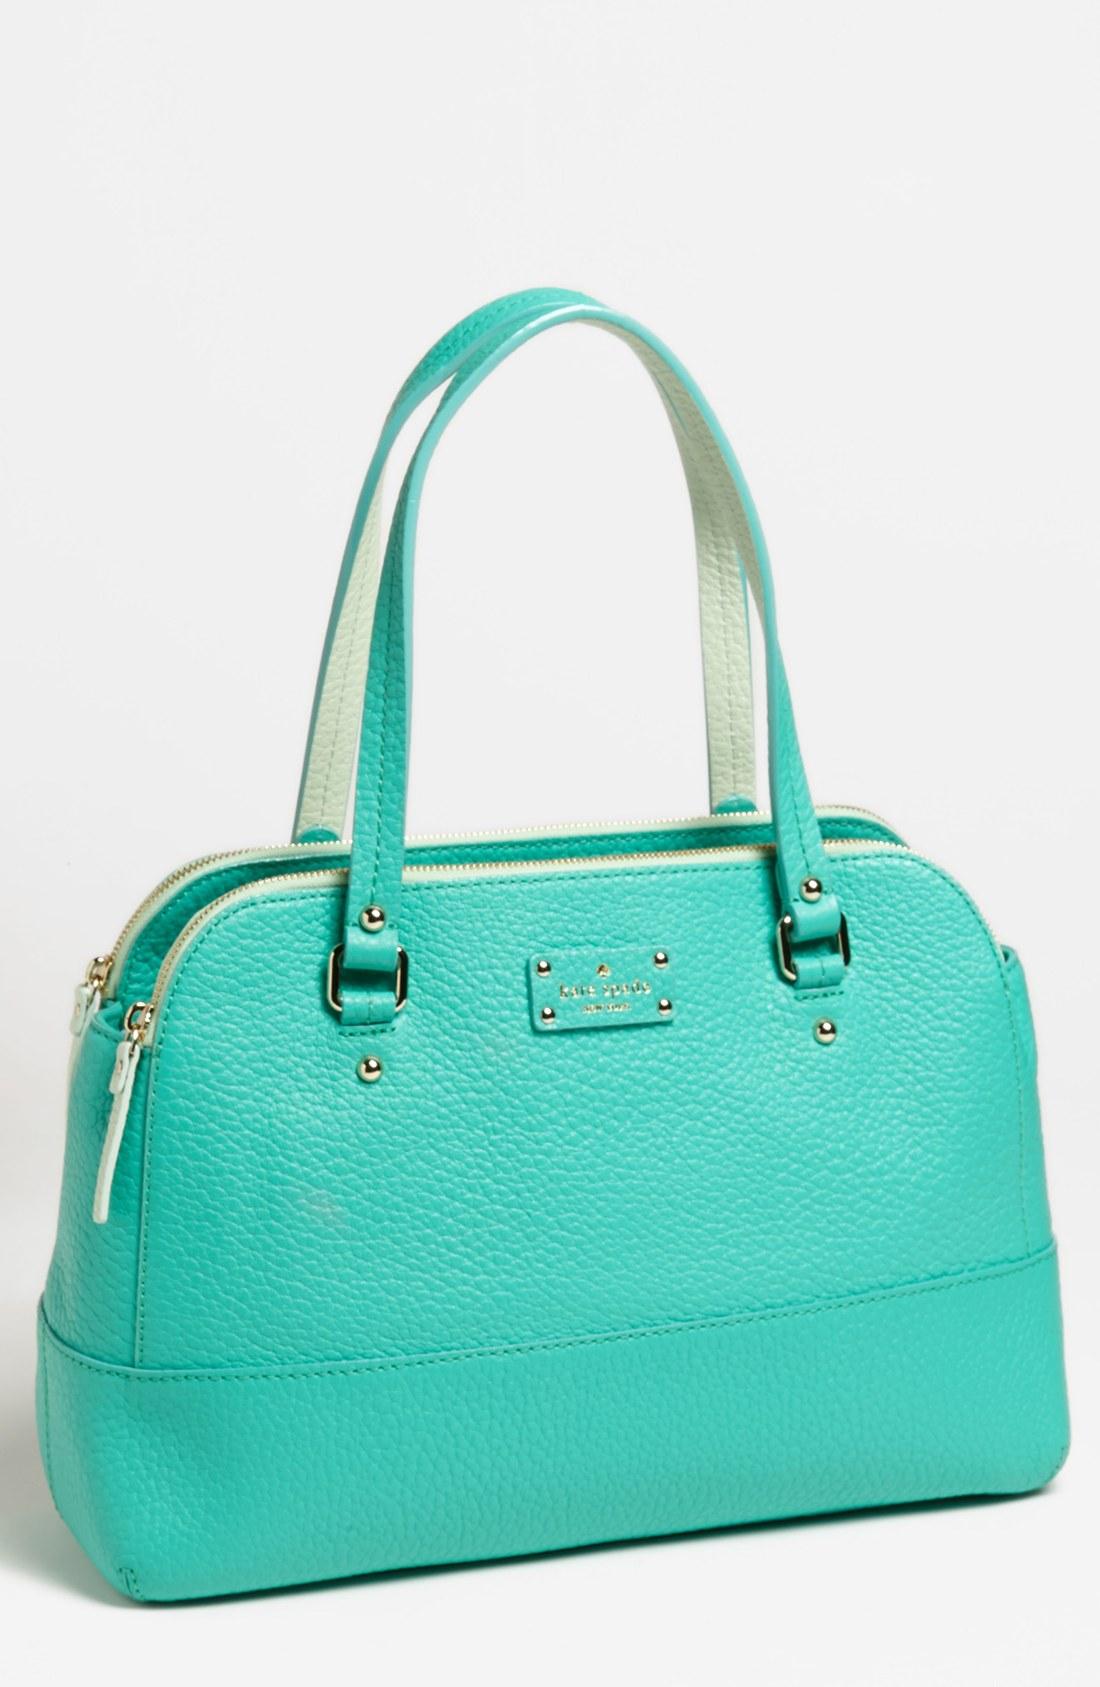 Kate Spade Blue Grove Court Lainey Shoulder Bag 43